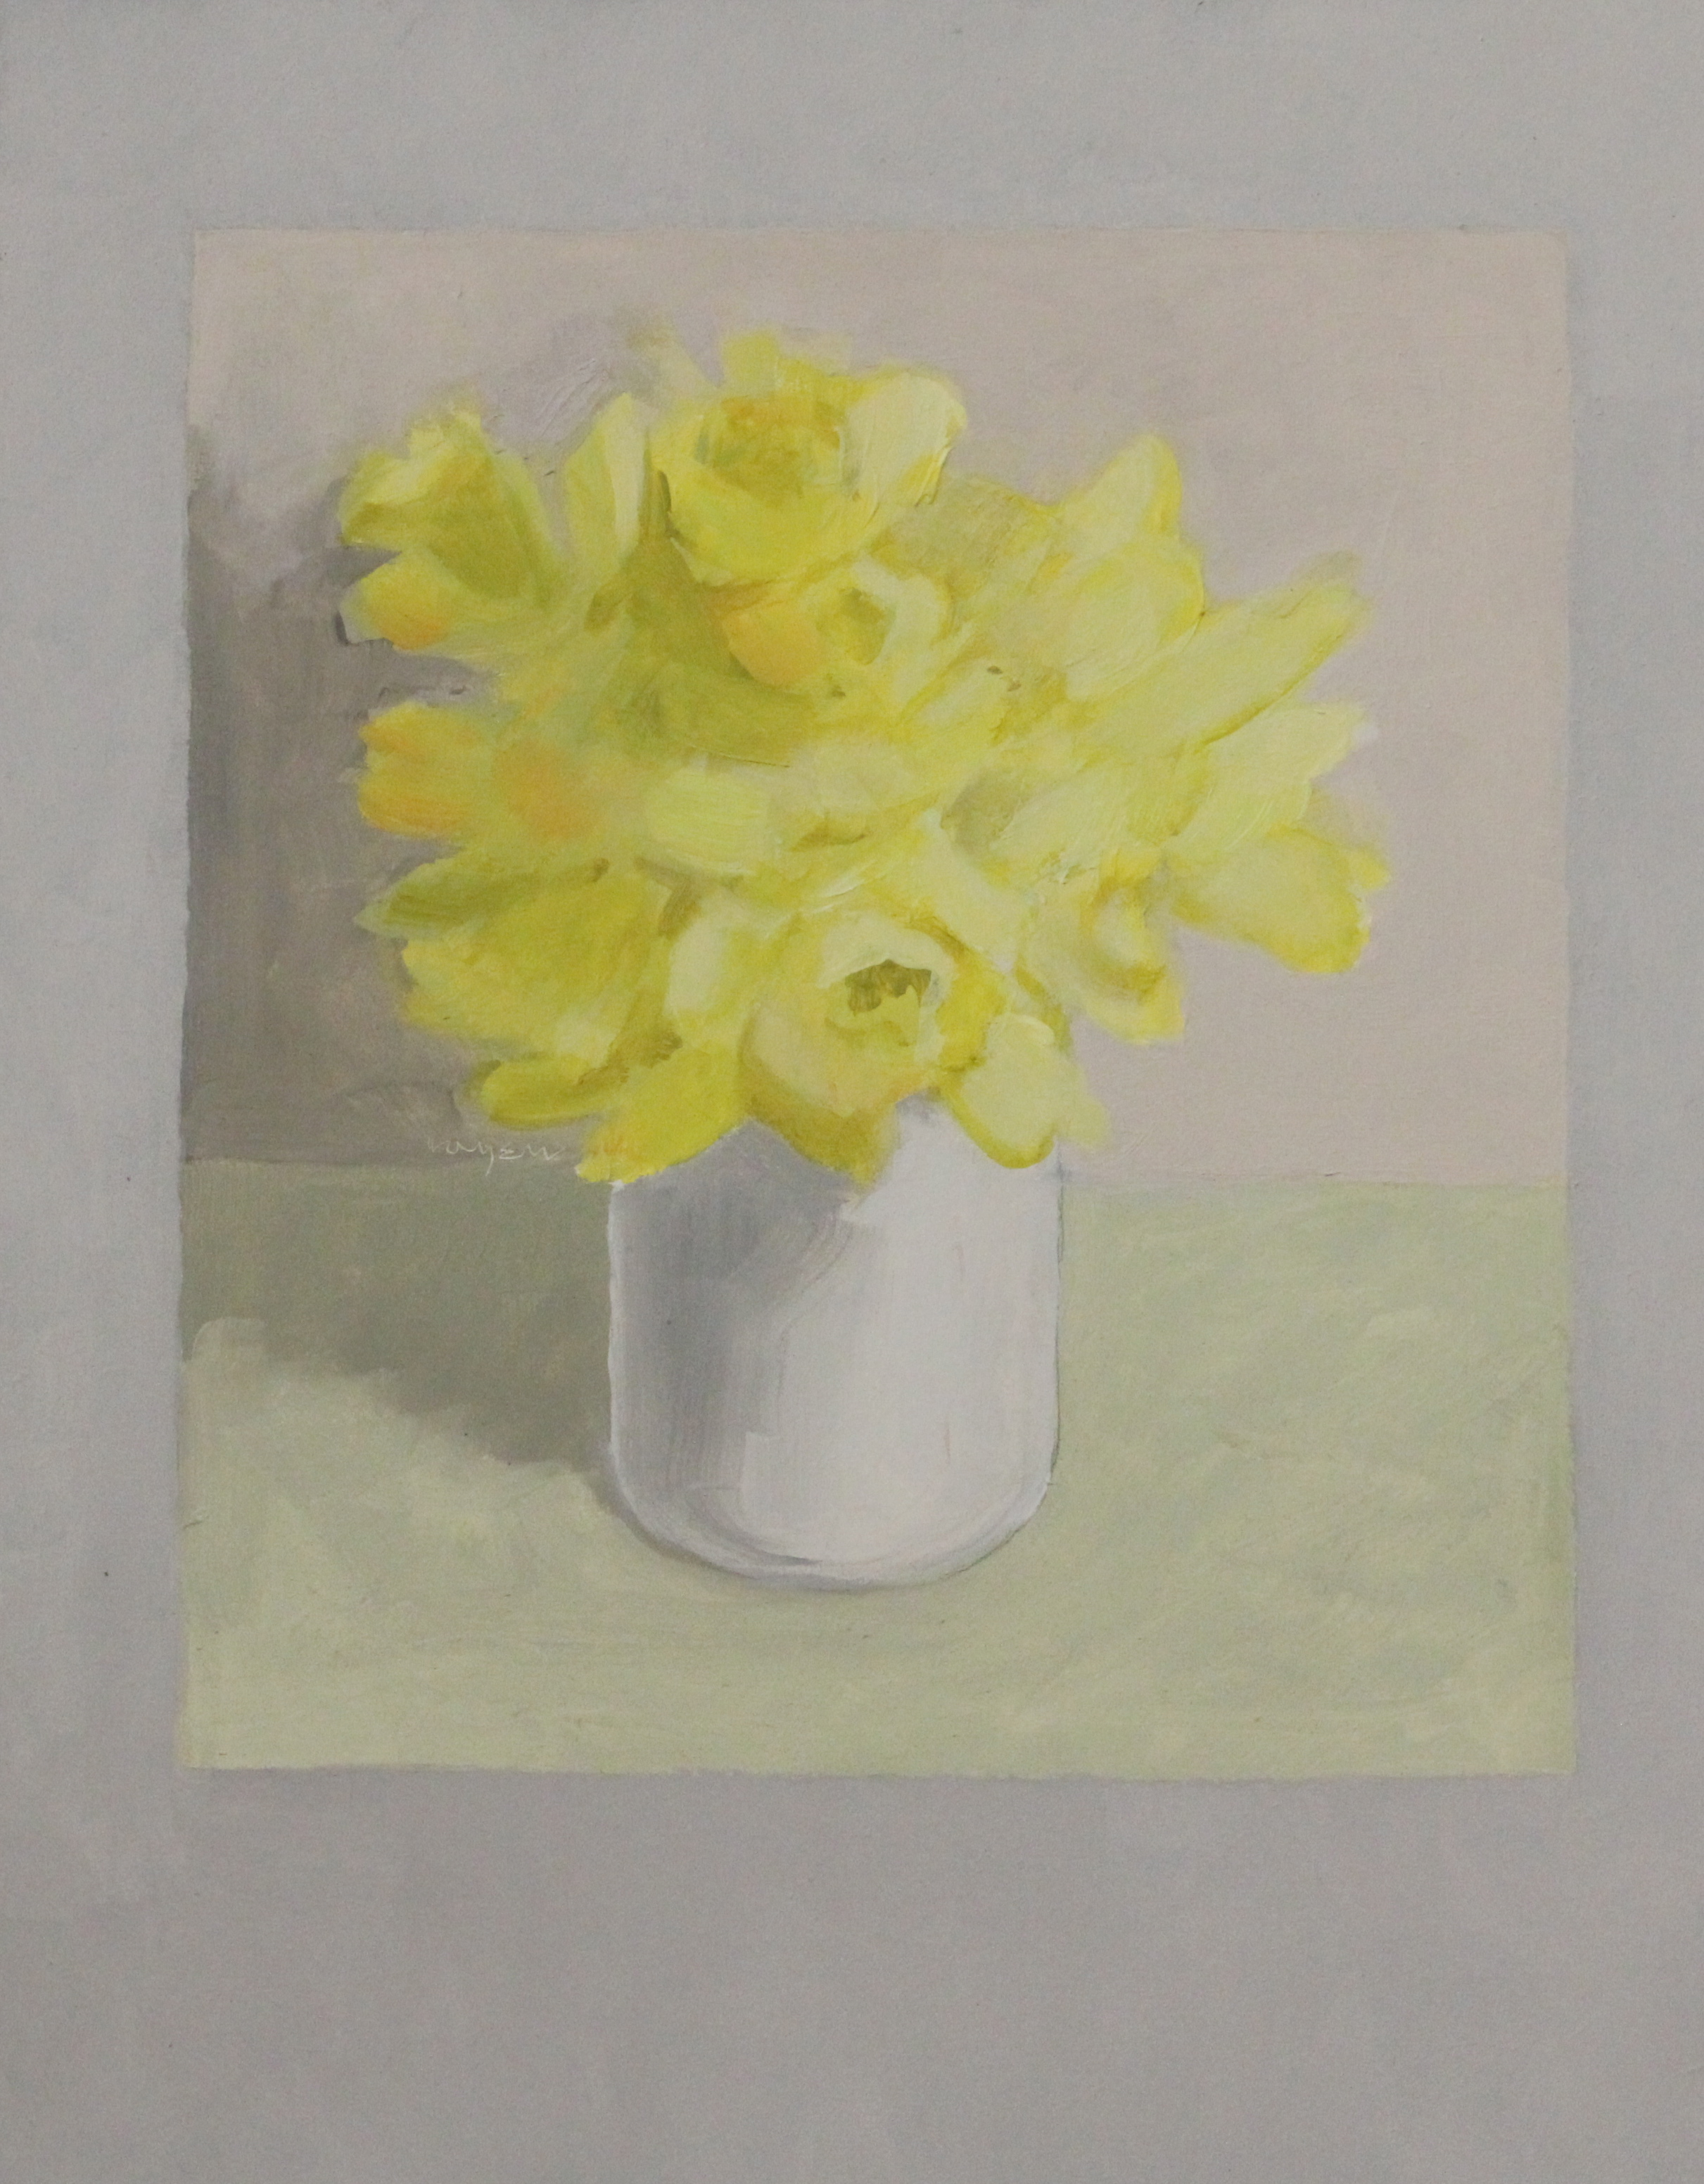 Flower #2 (Yellow Flower)- 11x14%22 .JPG